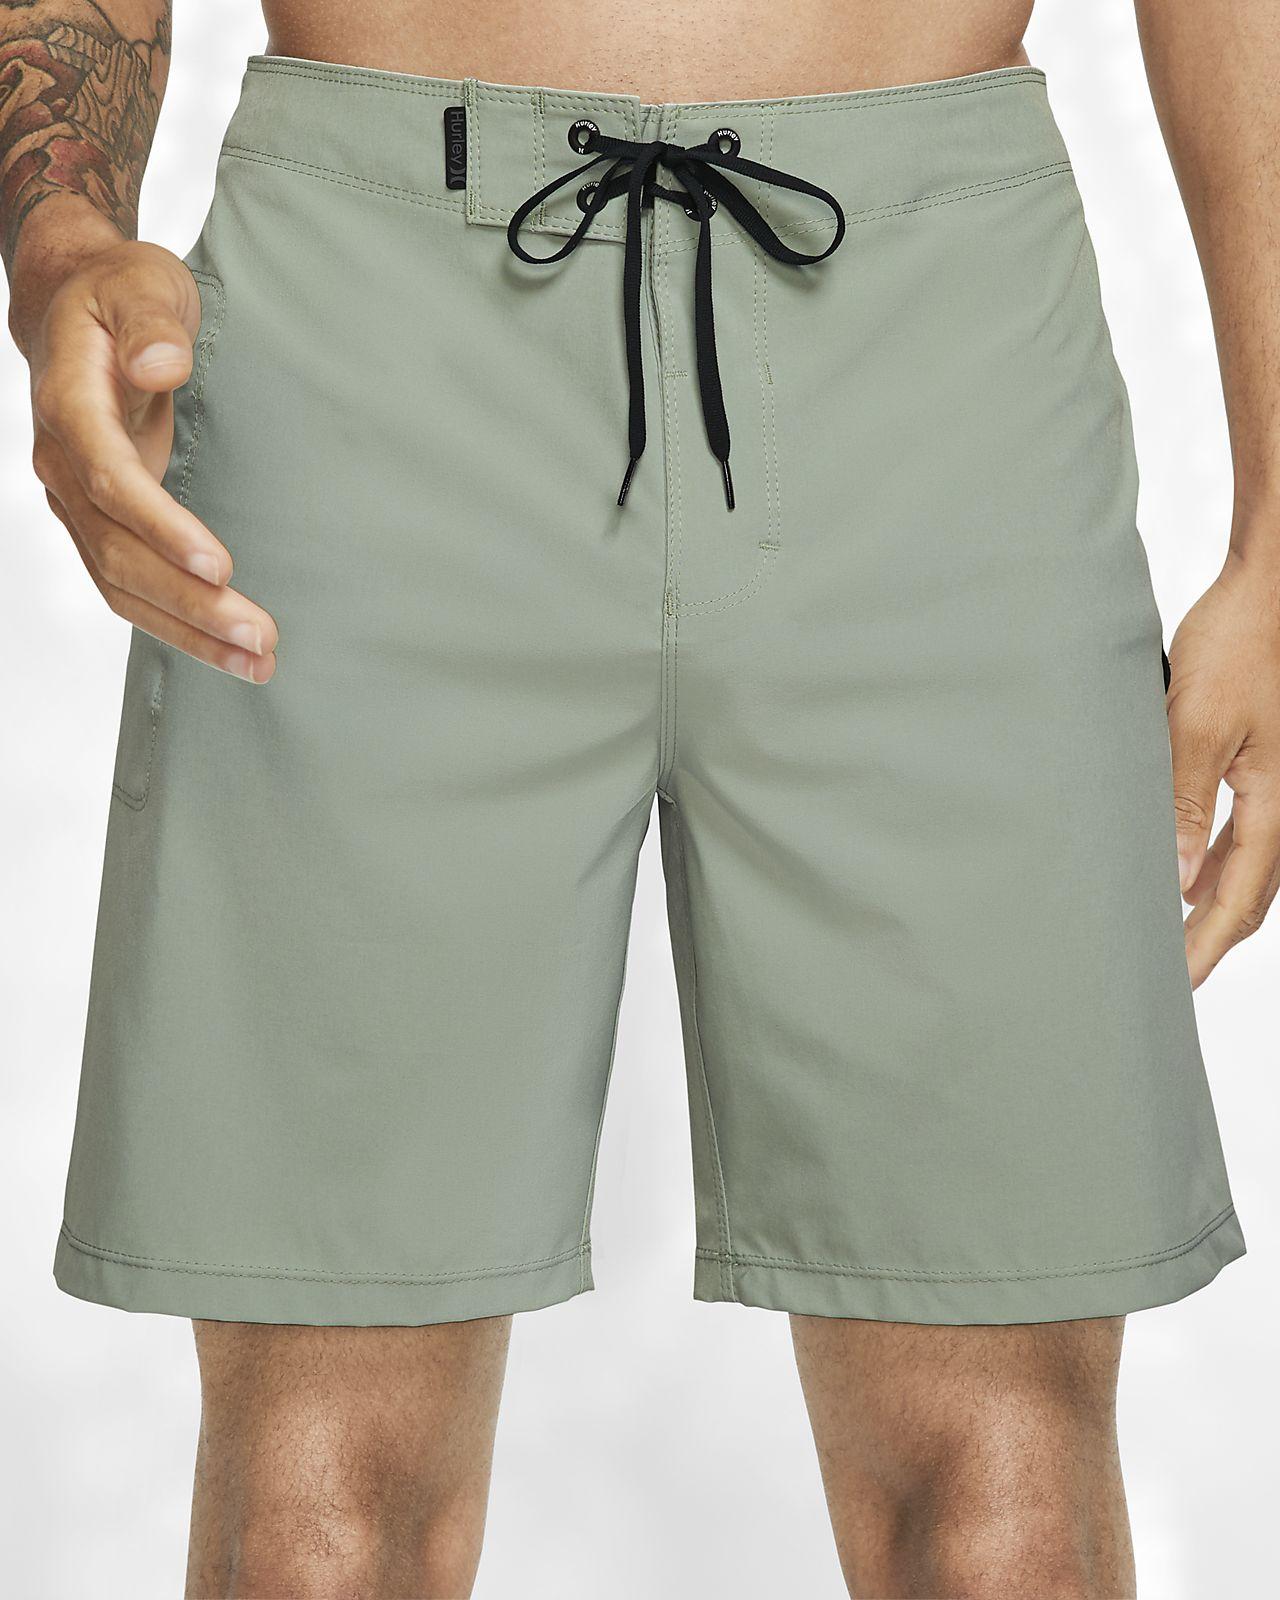 Hurley Phantom One and Only Herren-Boardshorts (ca. 45,5 cm)